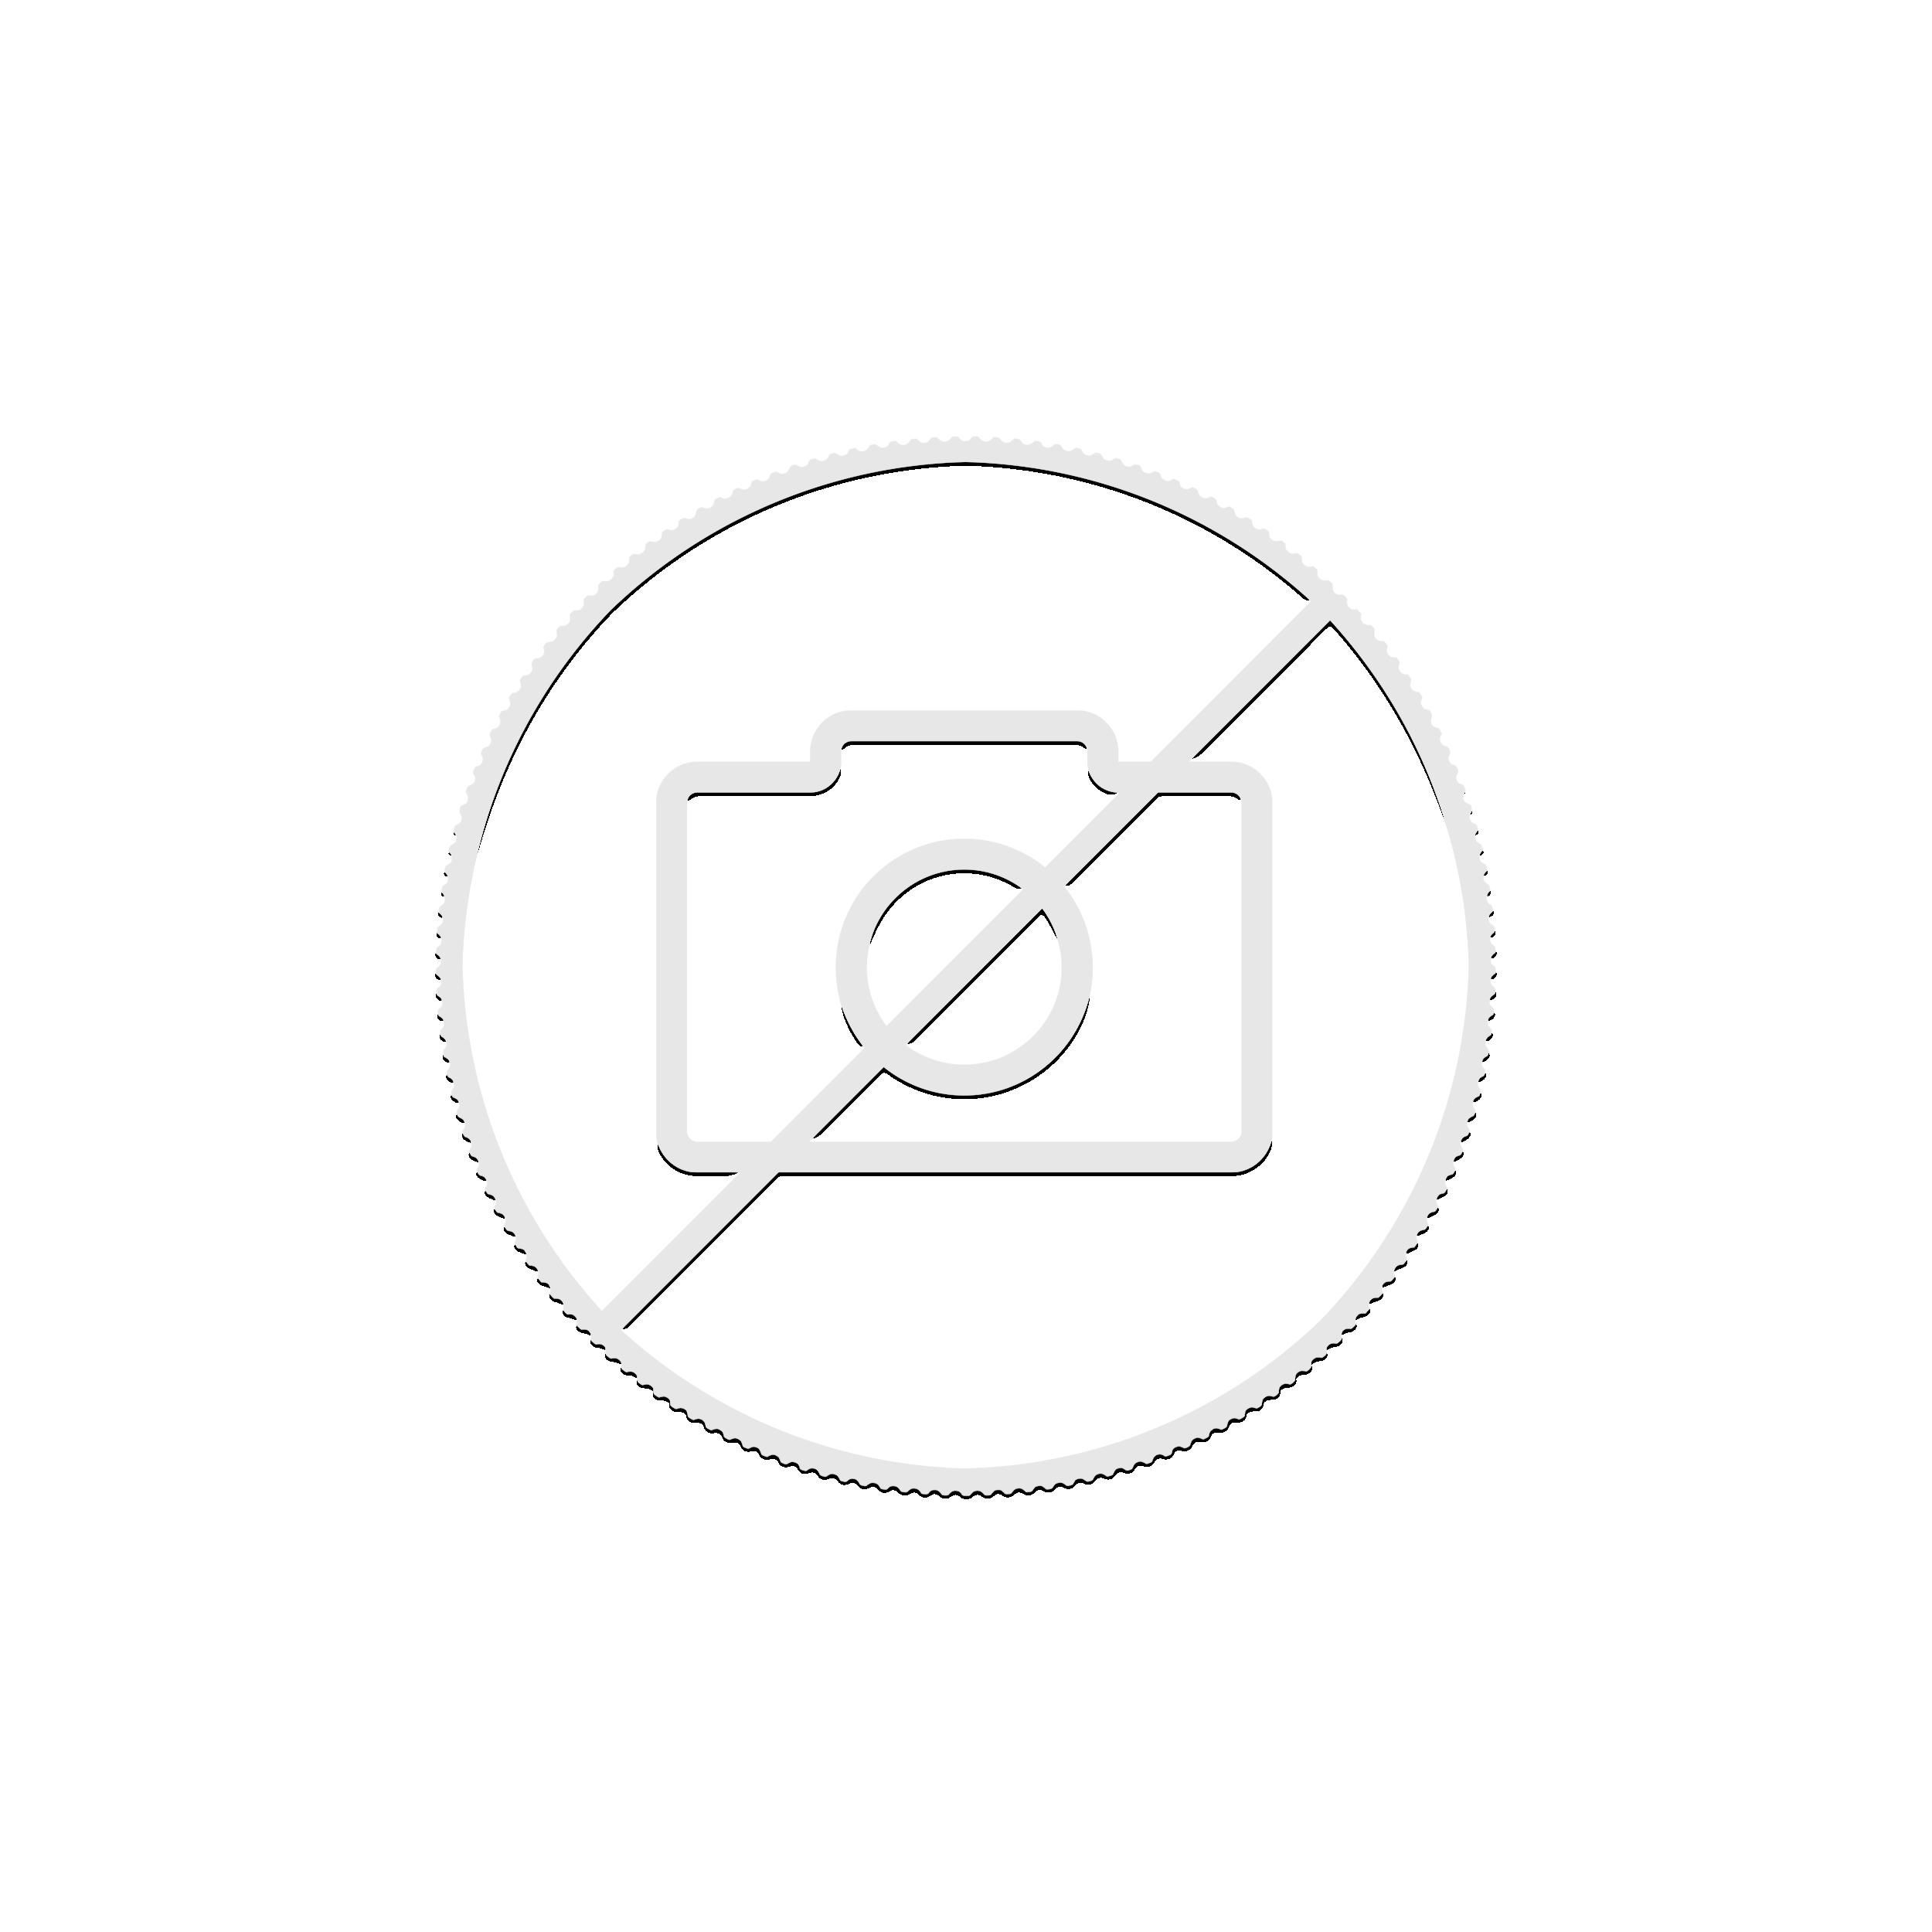 1 troy ounce silver coin Maple Leaf Voyageur 2017